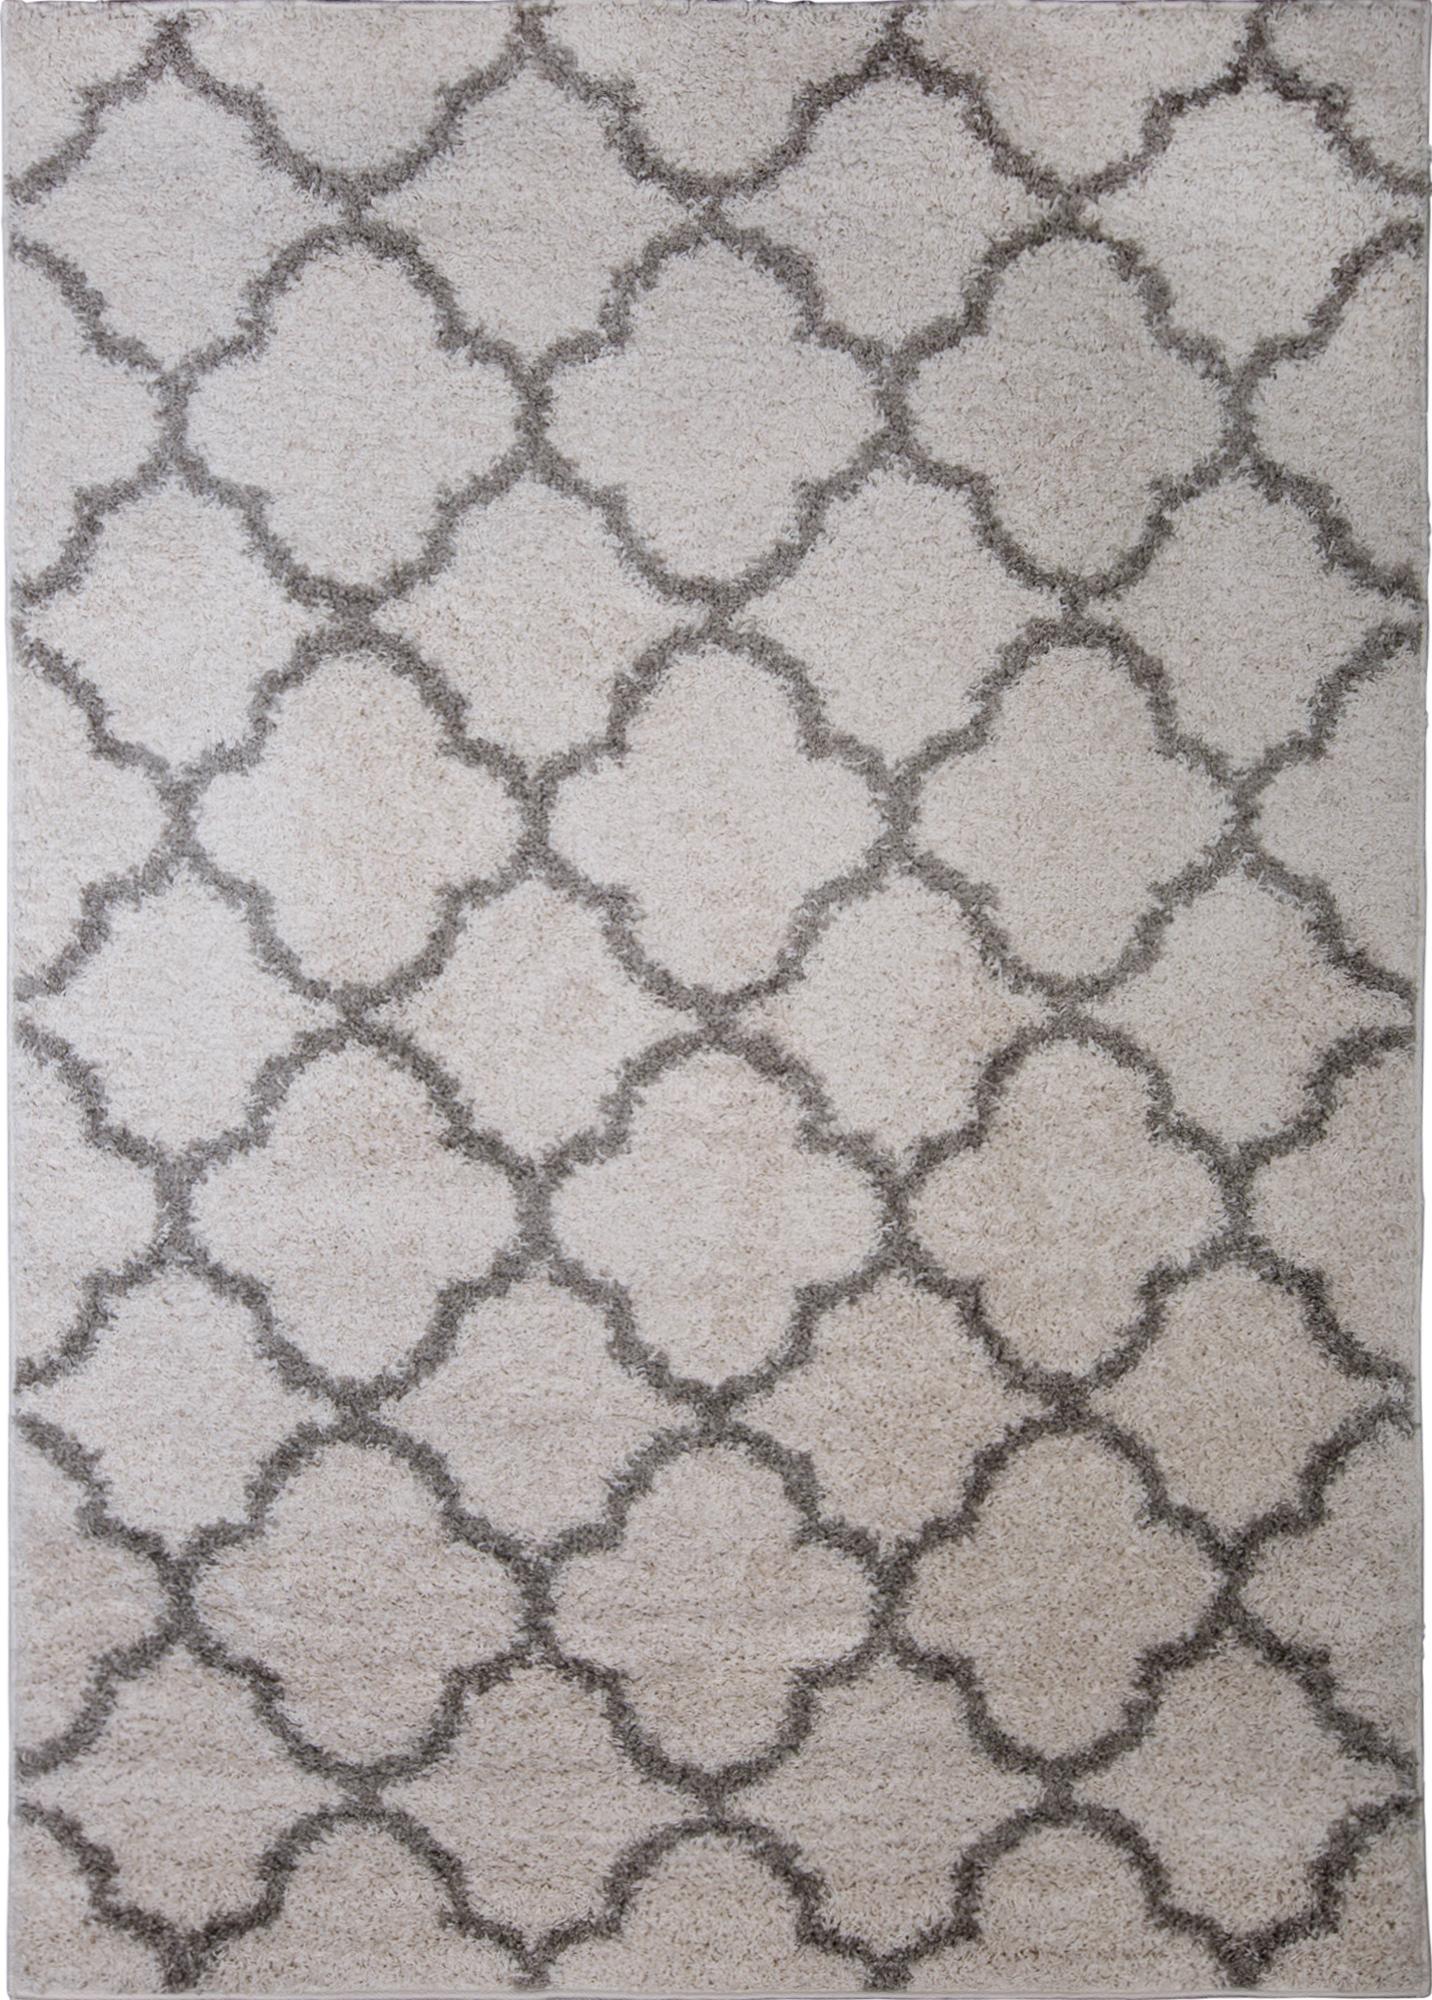 rug nicole miller nmhvs blend carpet solid gray area rugs flokati shag rs itm designer cotton nm